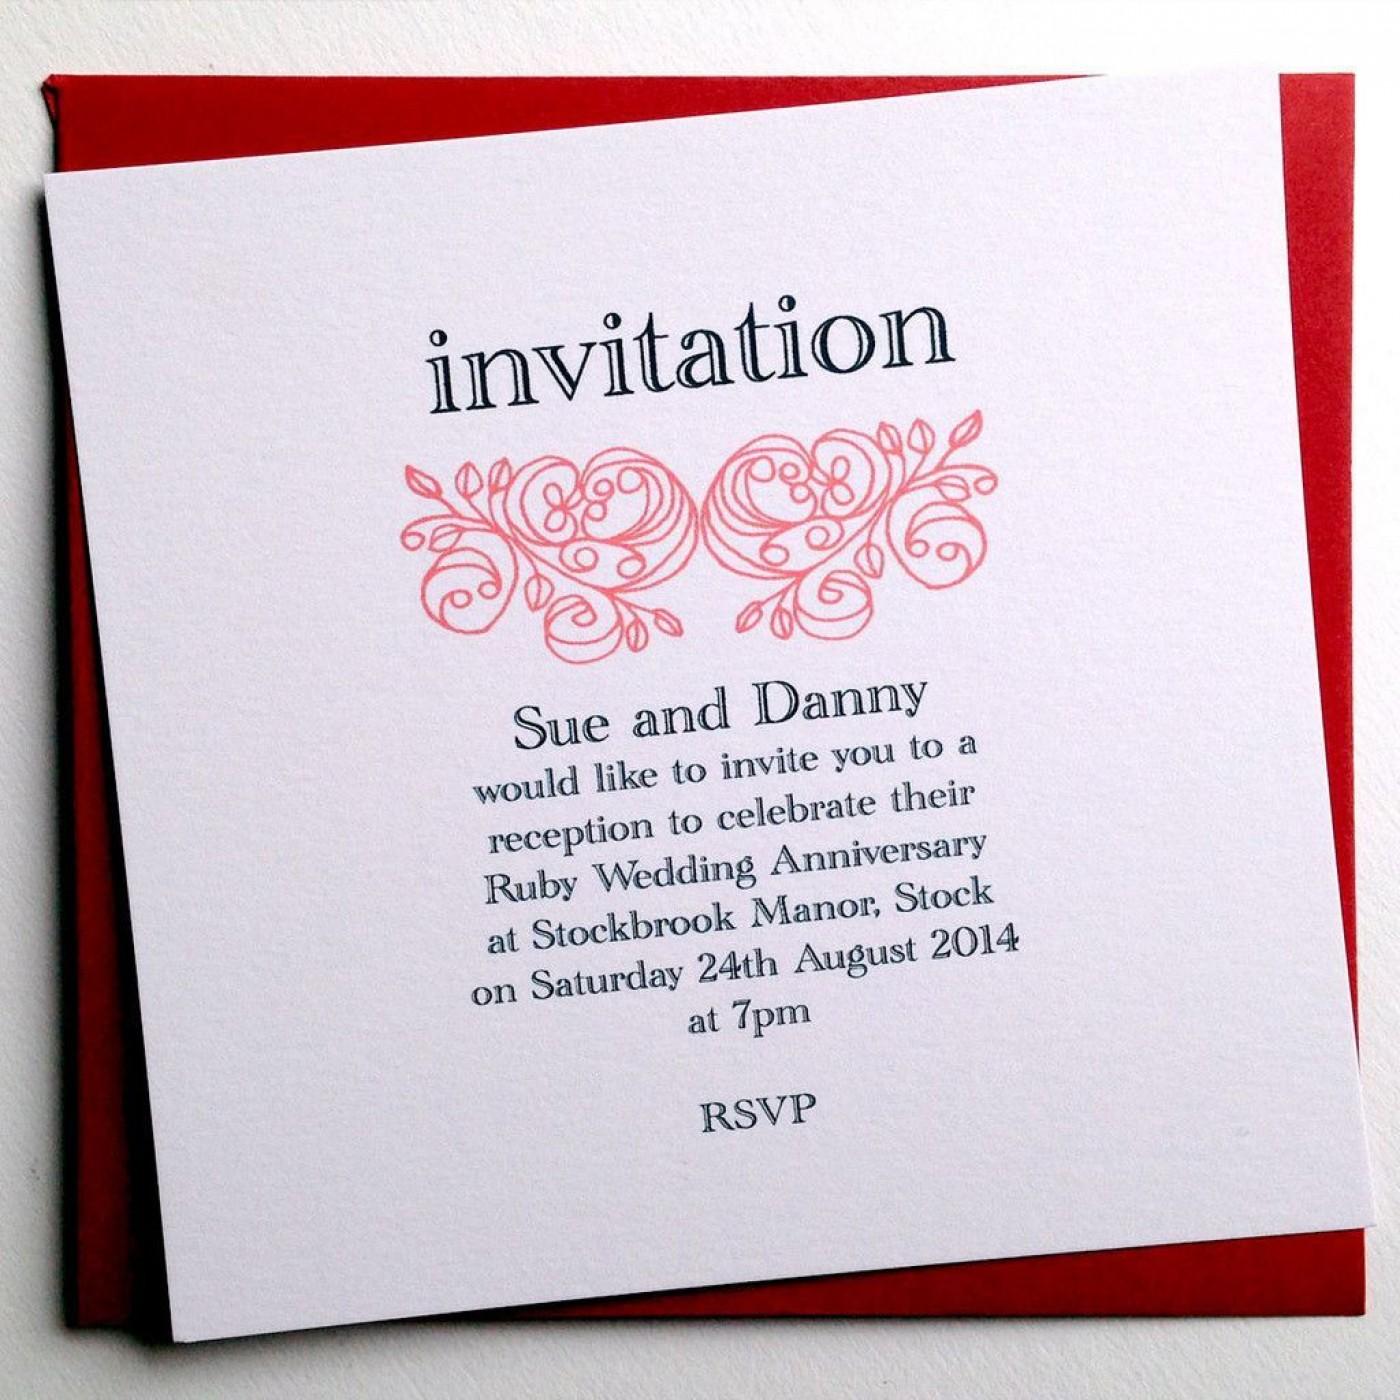 001 Phenomenal 50th Anniversary Invitation Wording Sample Concept  Wedding 60th In Tamil Birthday1400